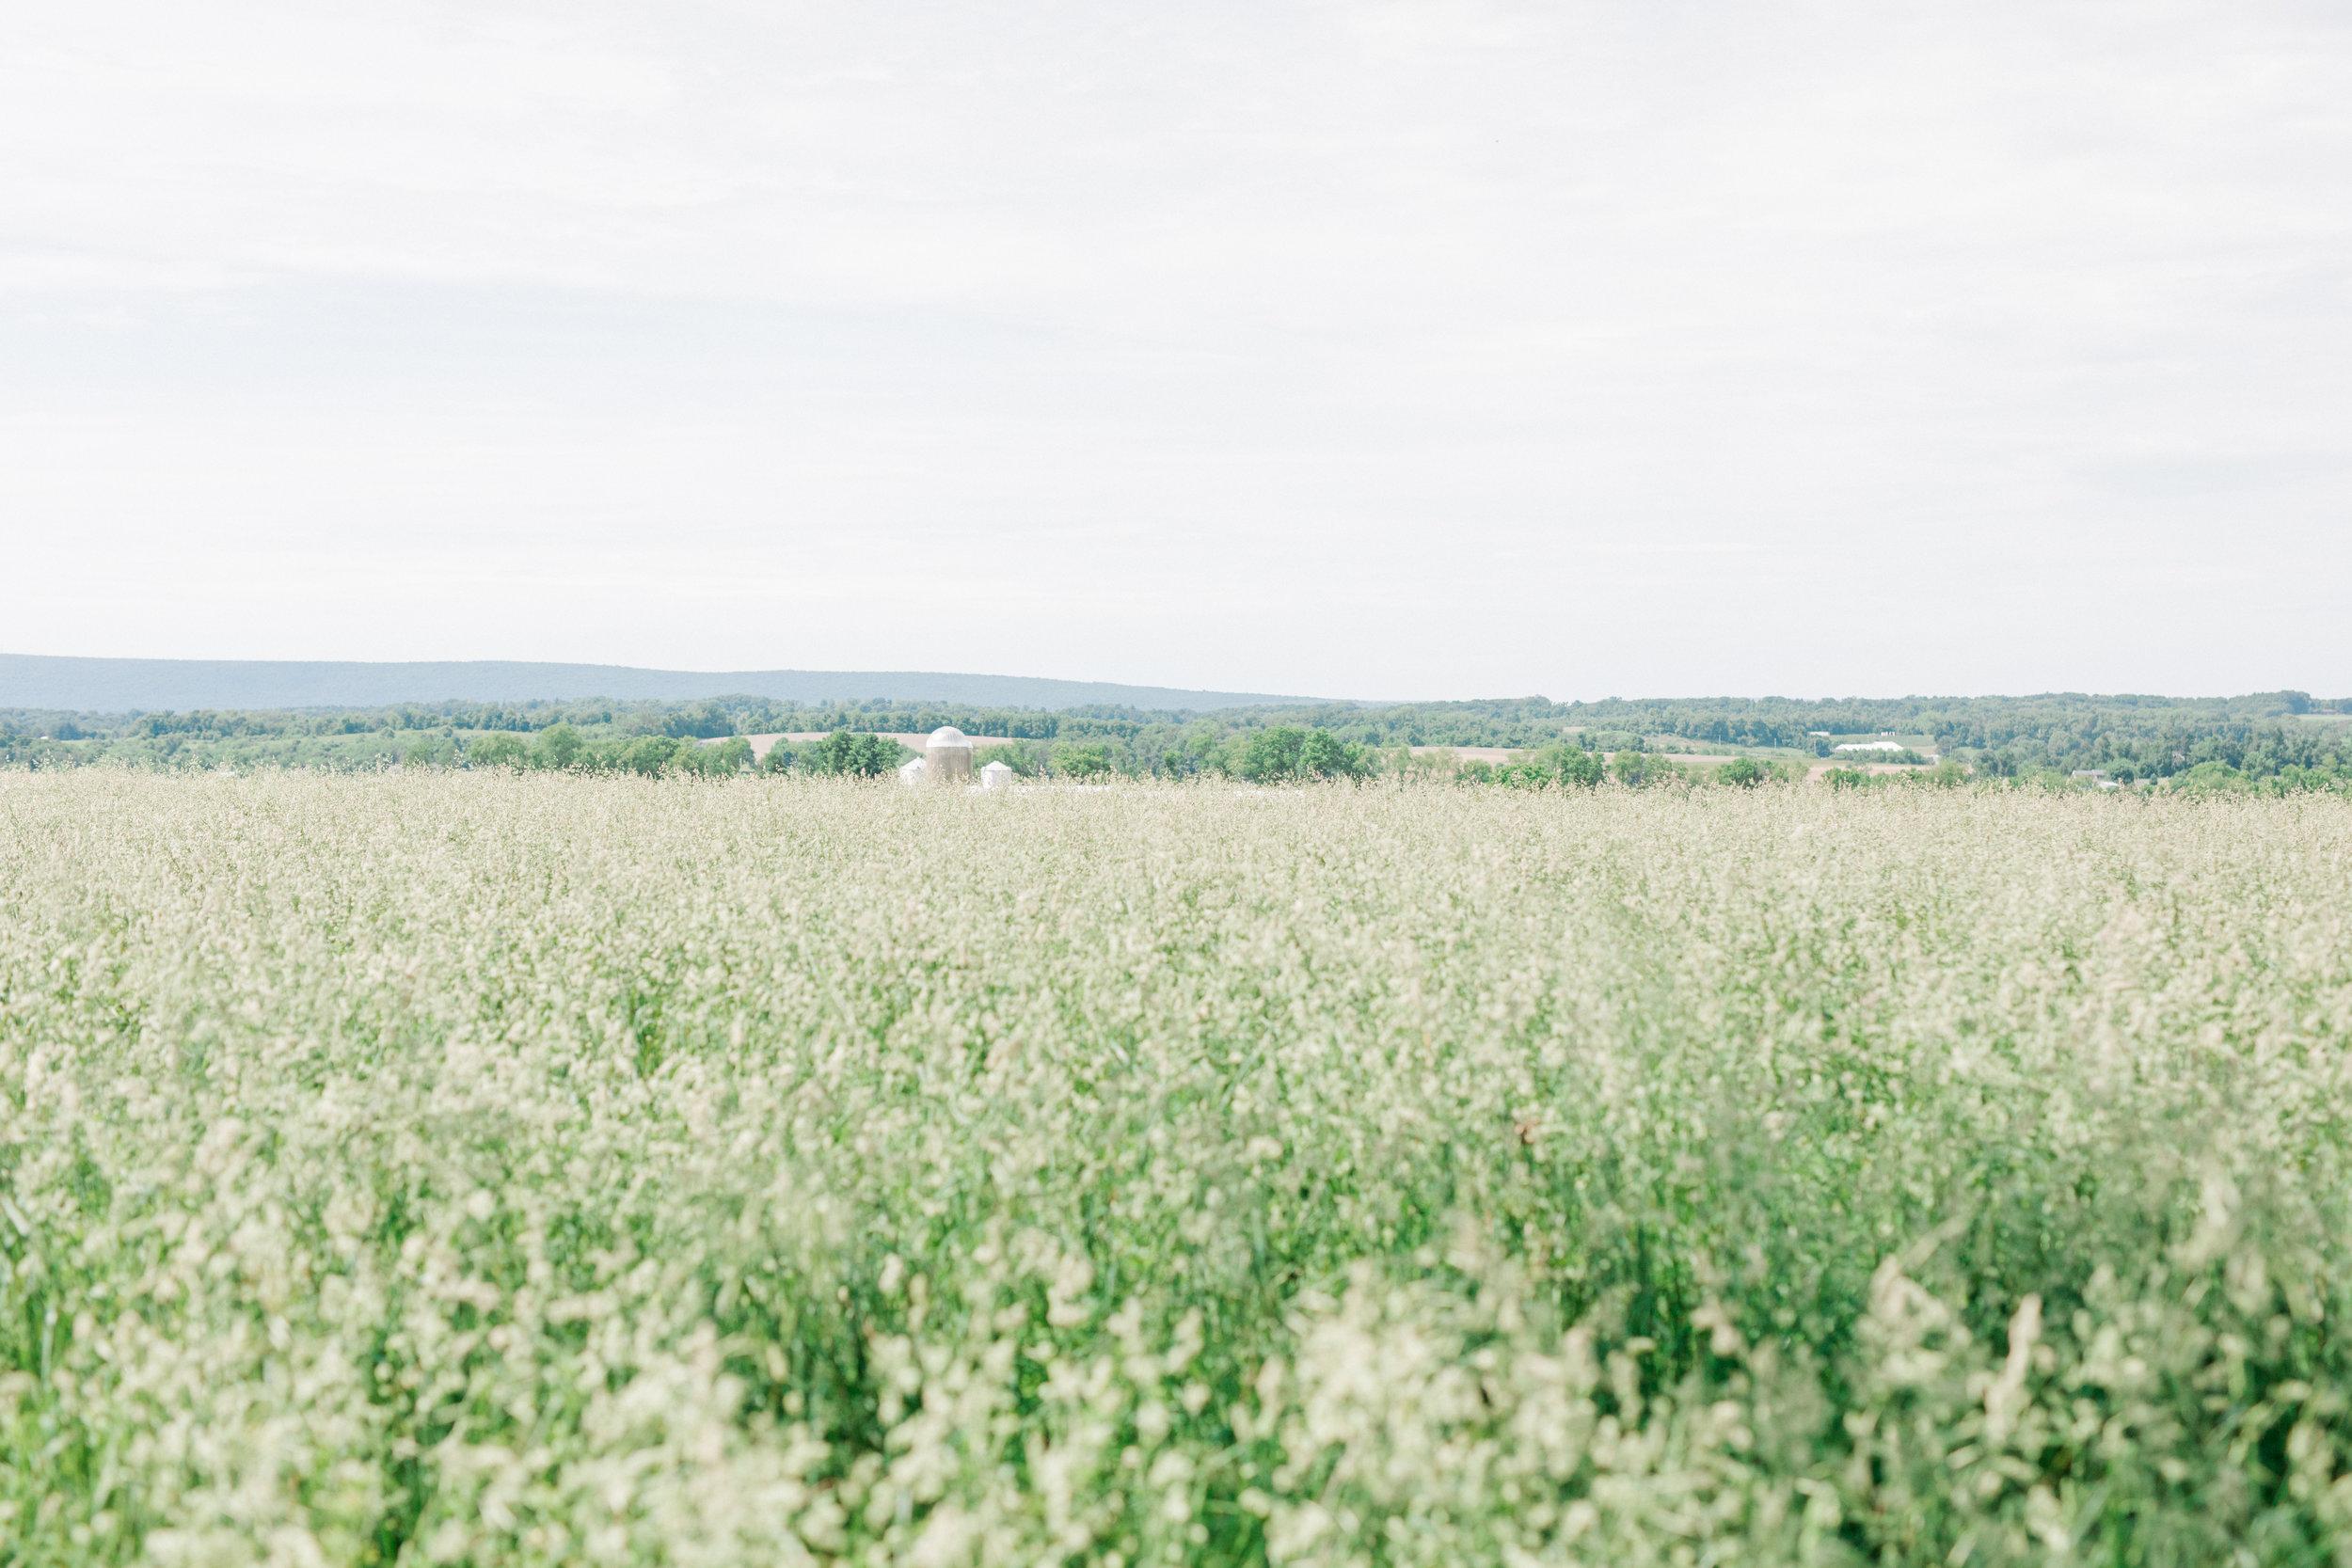 haley-richter-photography-fero-vineyards-summer-wedding-allison-and-josh-winery-pennsylvania-074.jpg